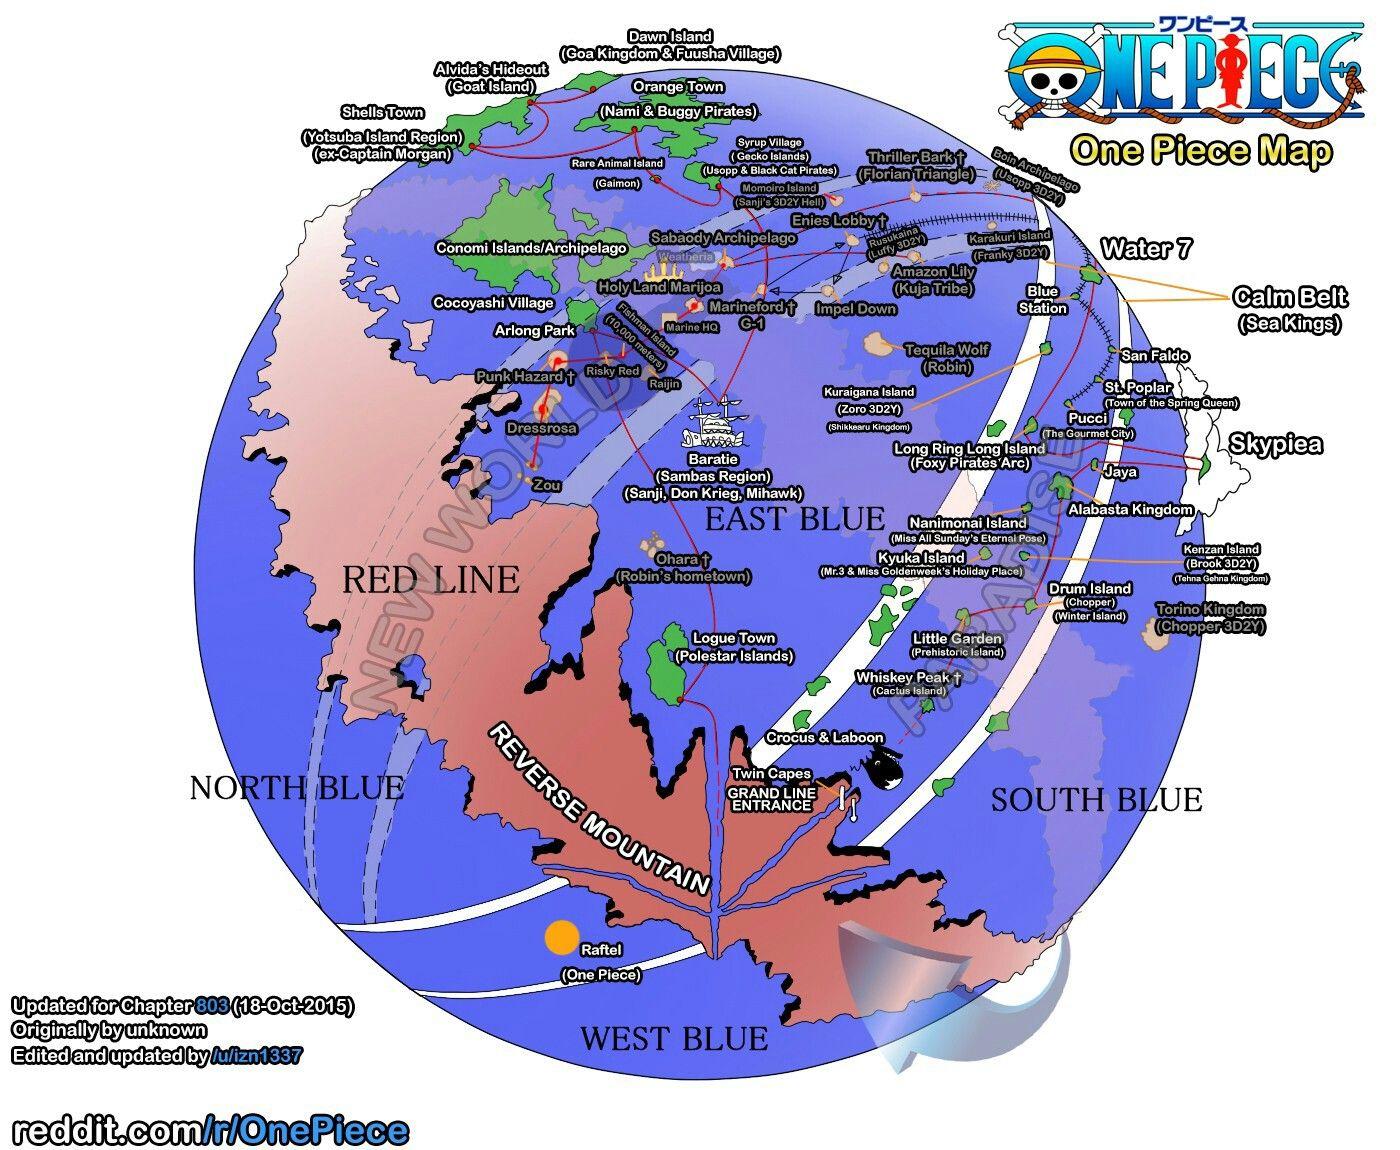 one piece carte du monde One piece world map | One pièce manga, Manga, Vingt ans